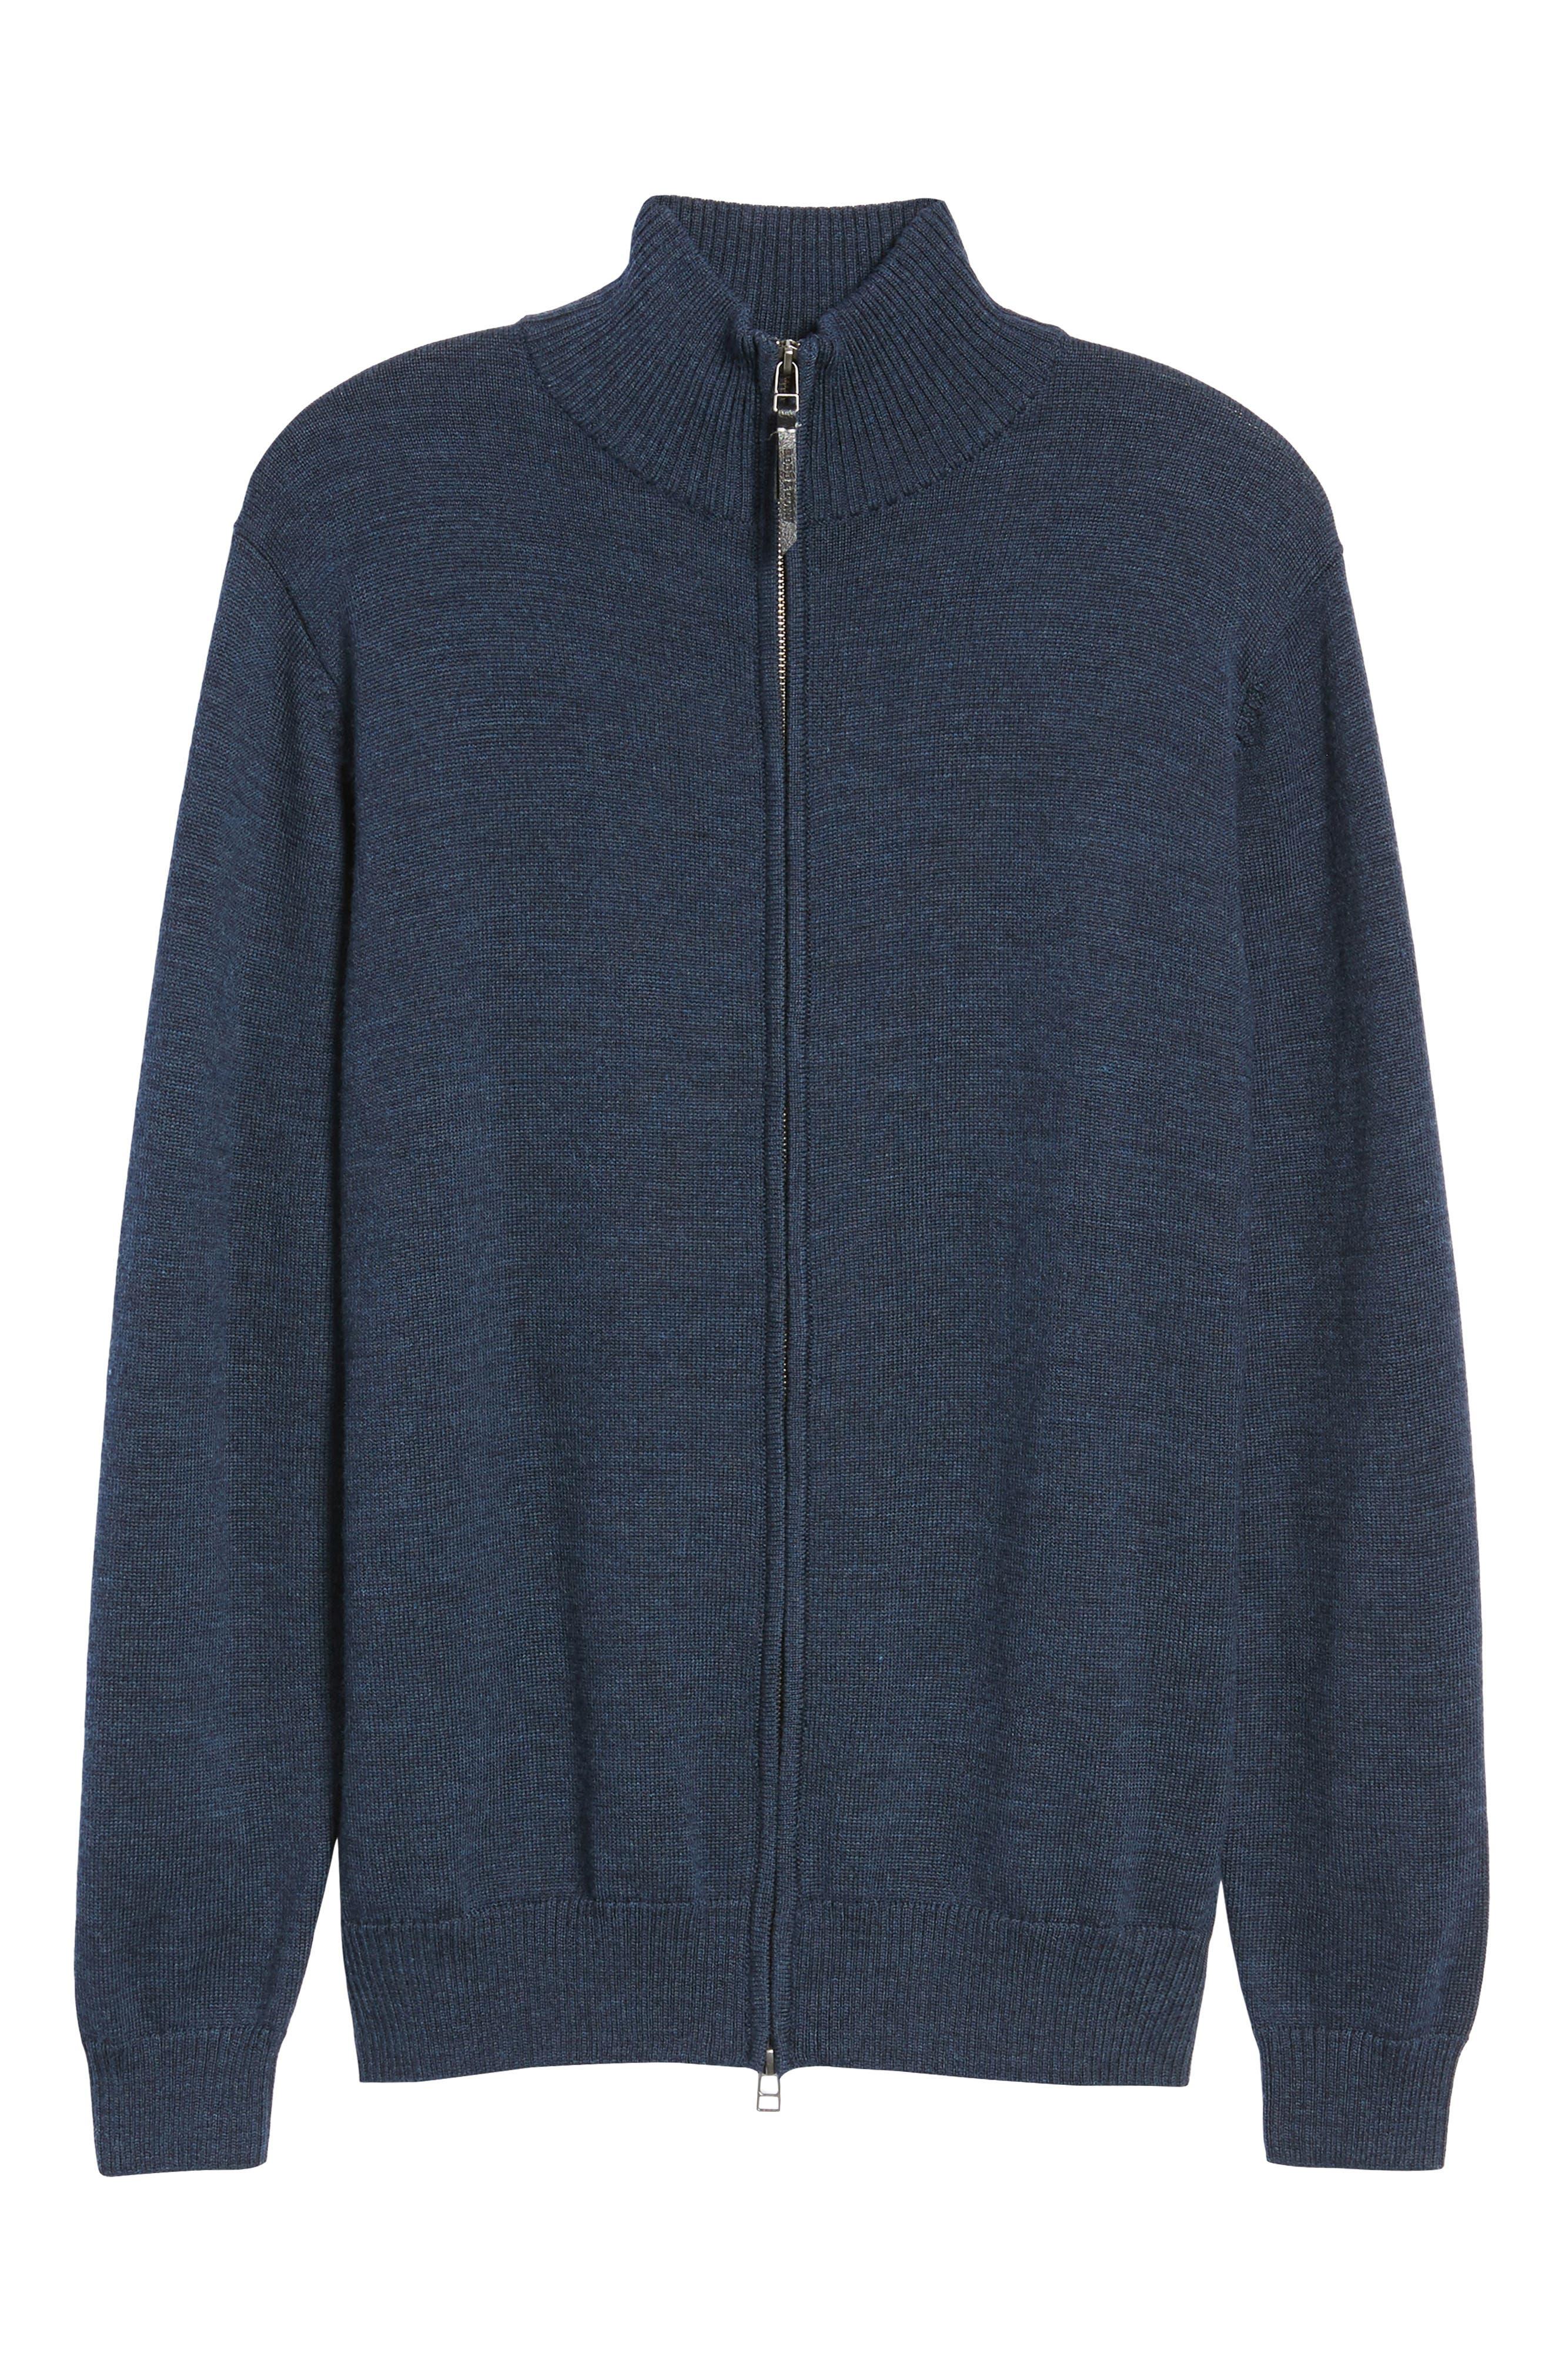 Roaring Meg Zip Wool Sweater,                             Alternate thumbnail 6, color,                             401